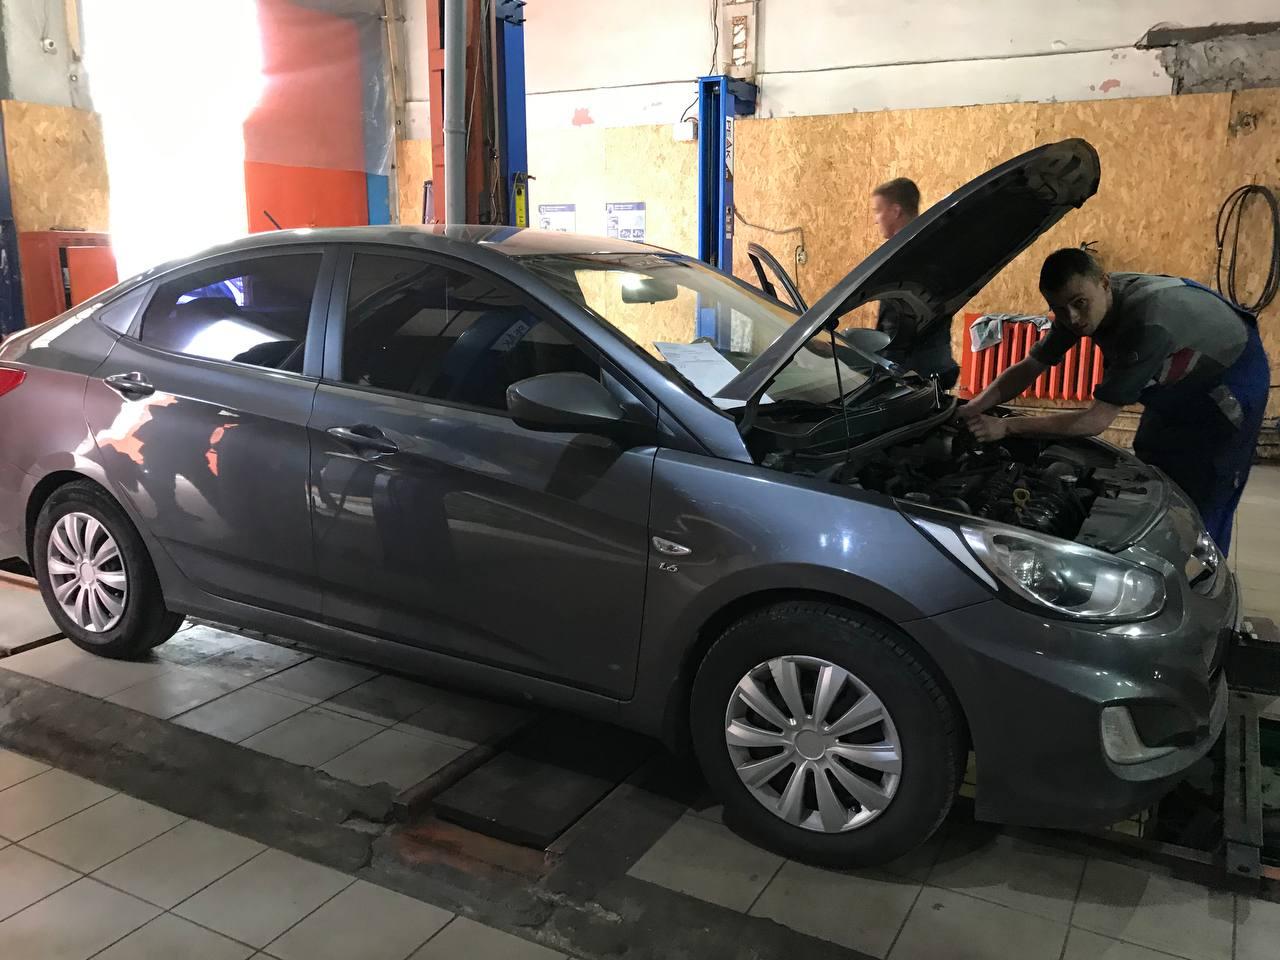 Чип тюнинг Хендай (Hyundai) Accent 2011 -> ... 1.6 i 123 л.с.